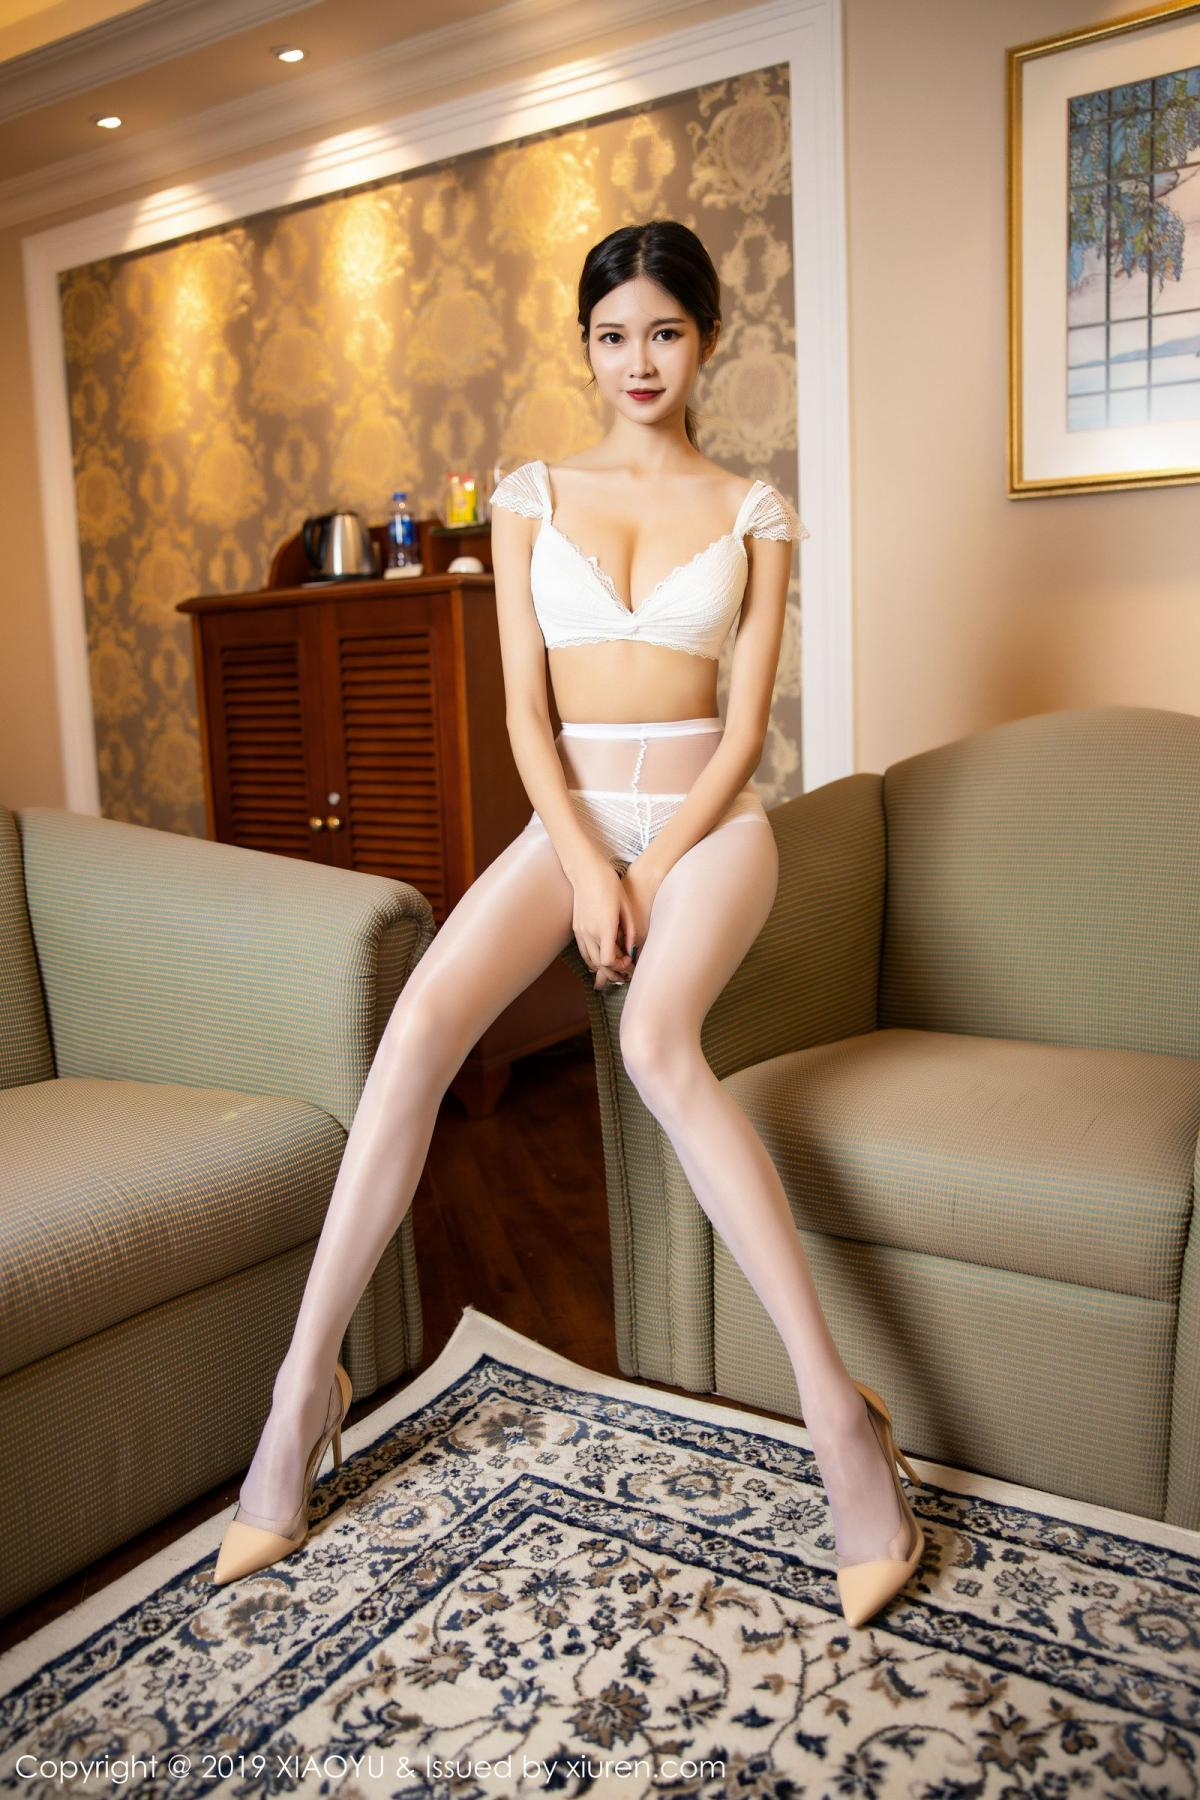 [XiaoYu] Vol.218 Cheng Cheng Cheng 24P, Cheng Cheng Cheng, Nurse, Tall, XiaoYu